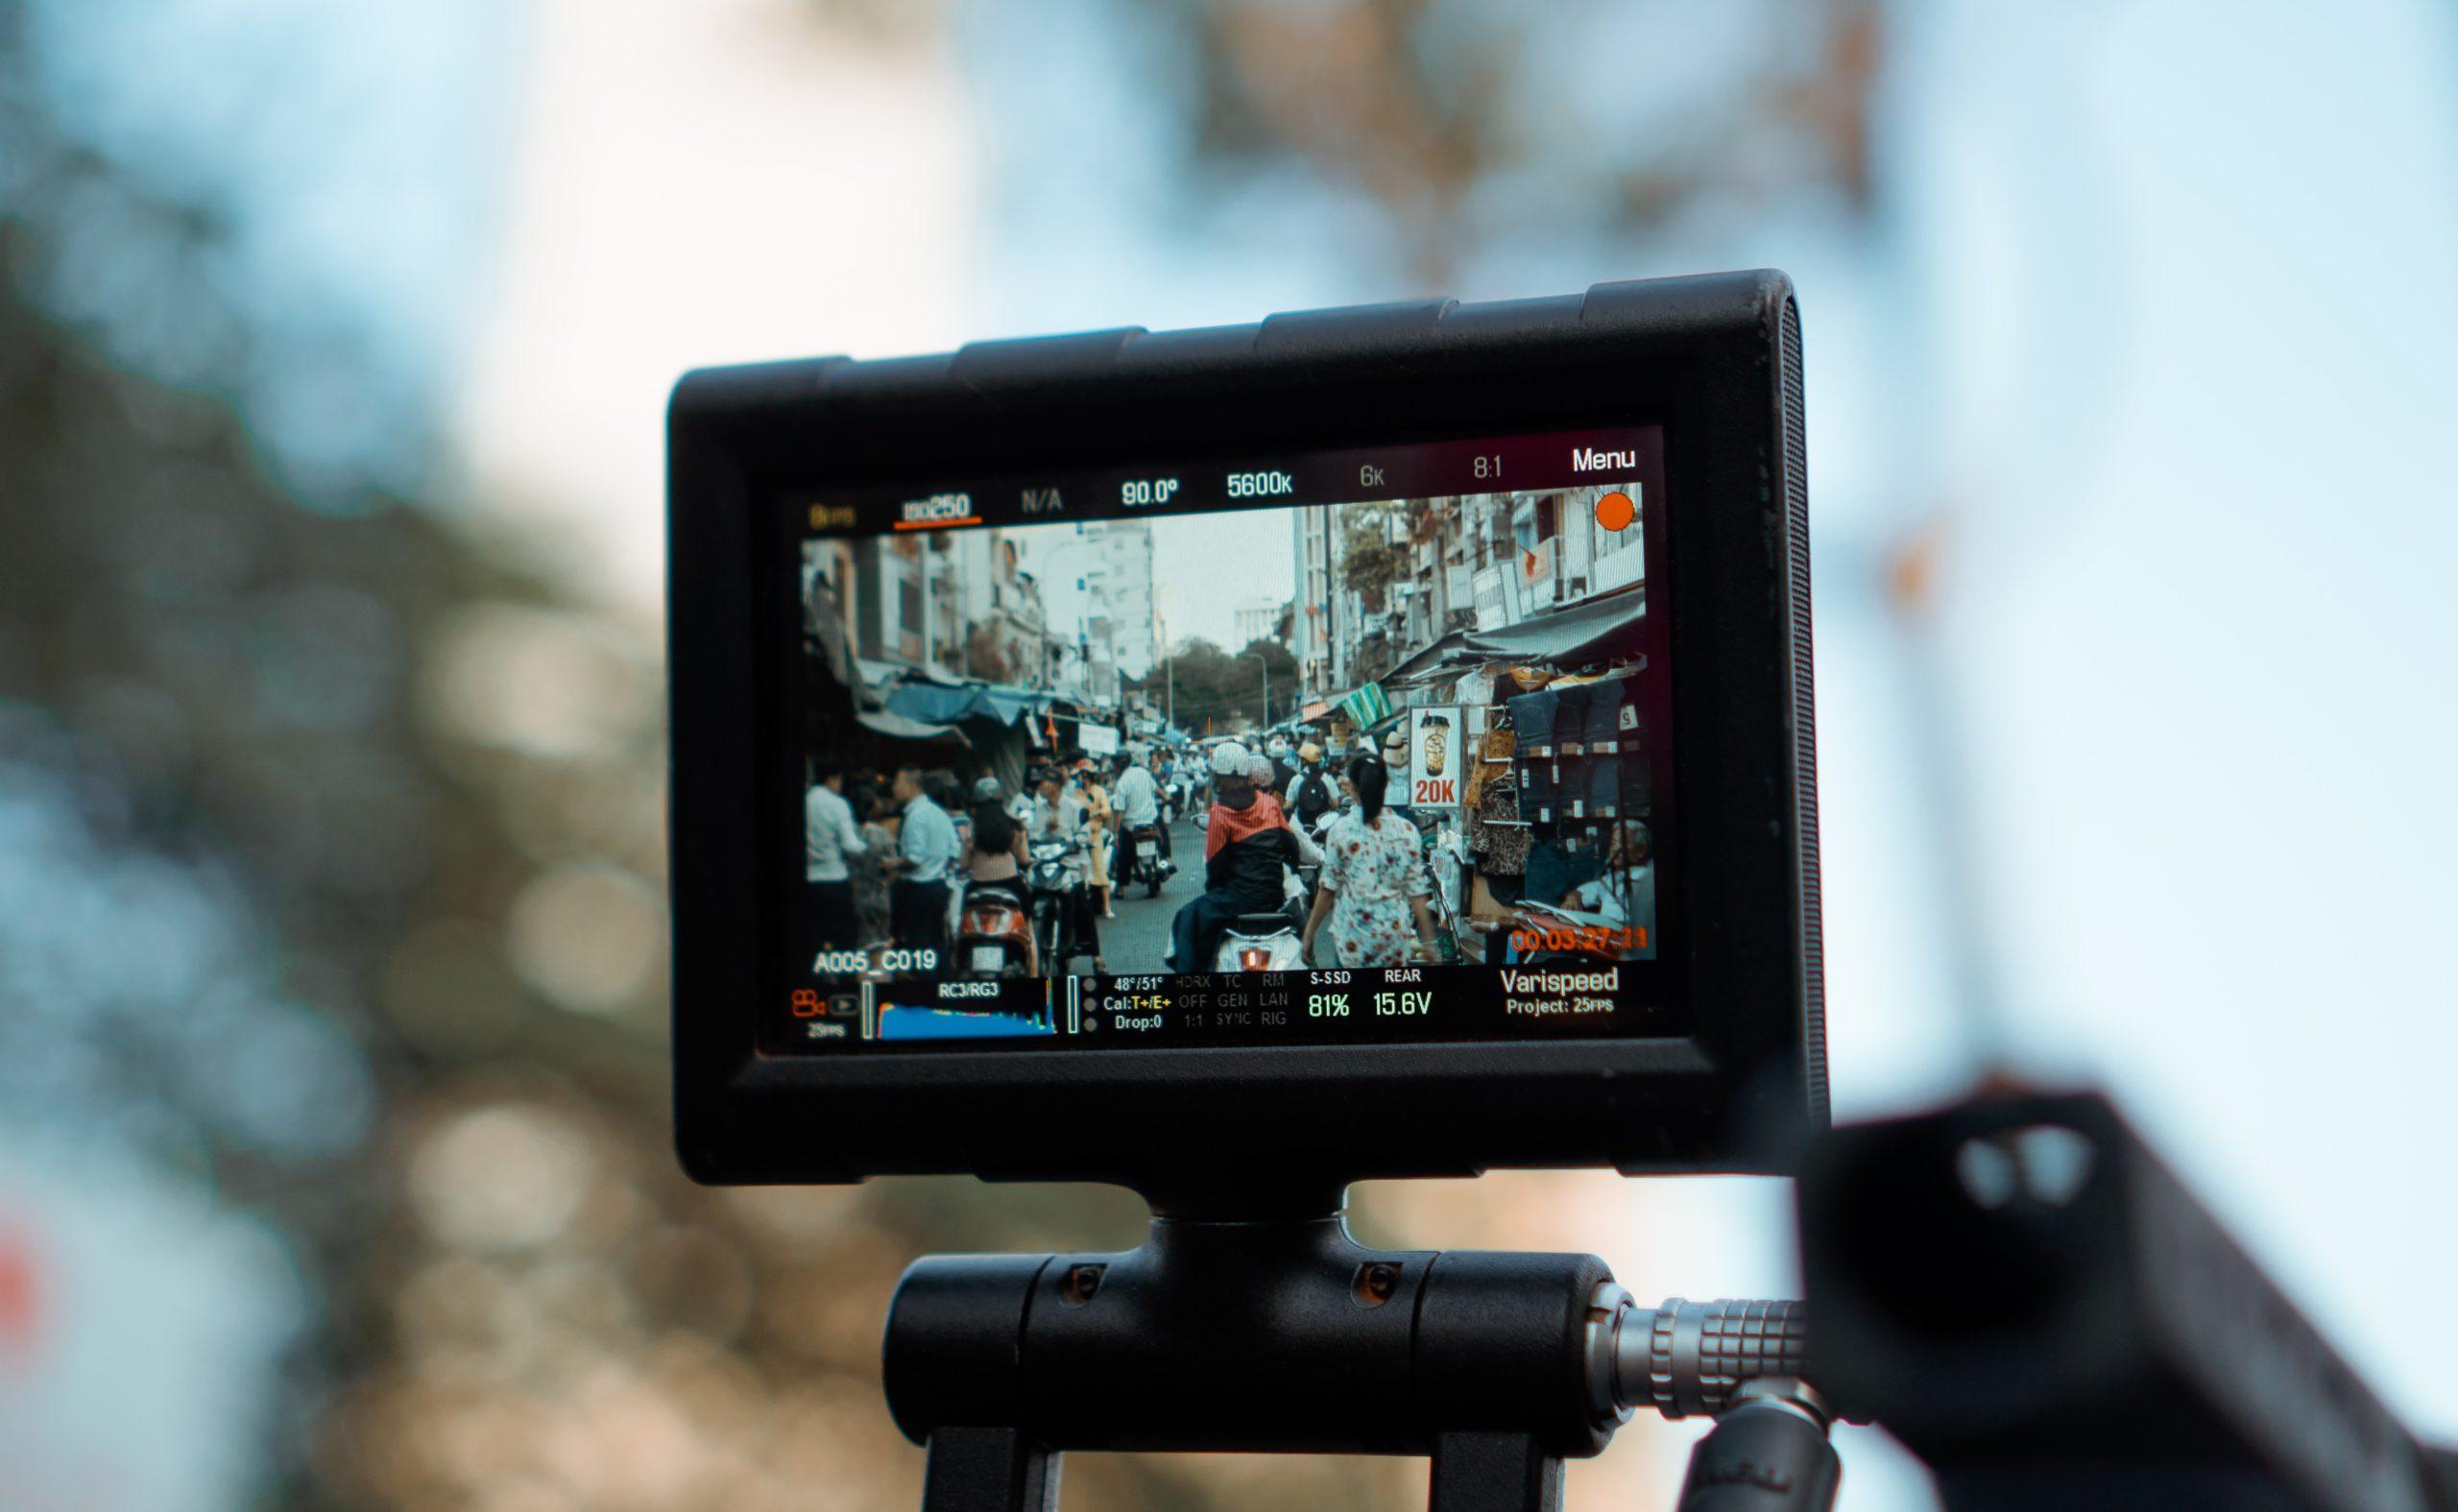 camera aspect ratio